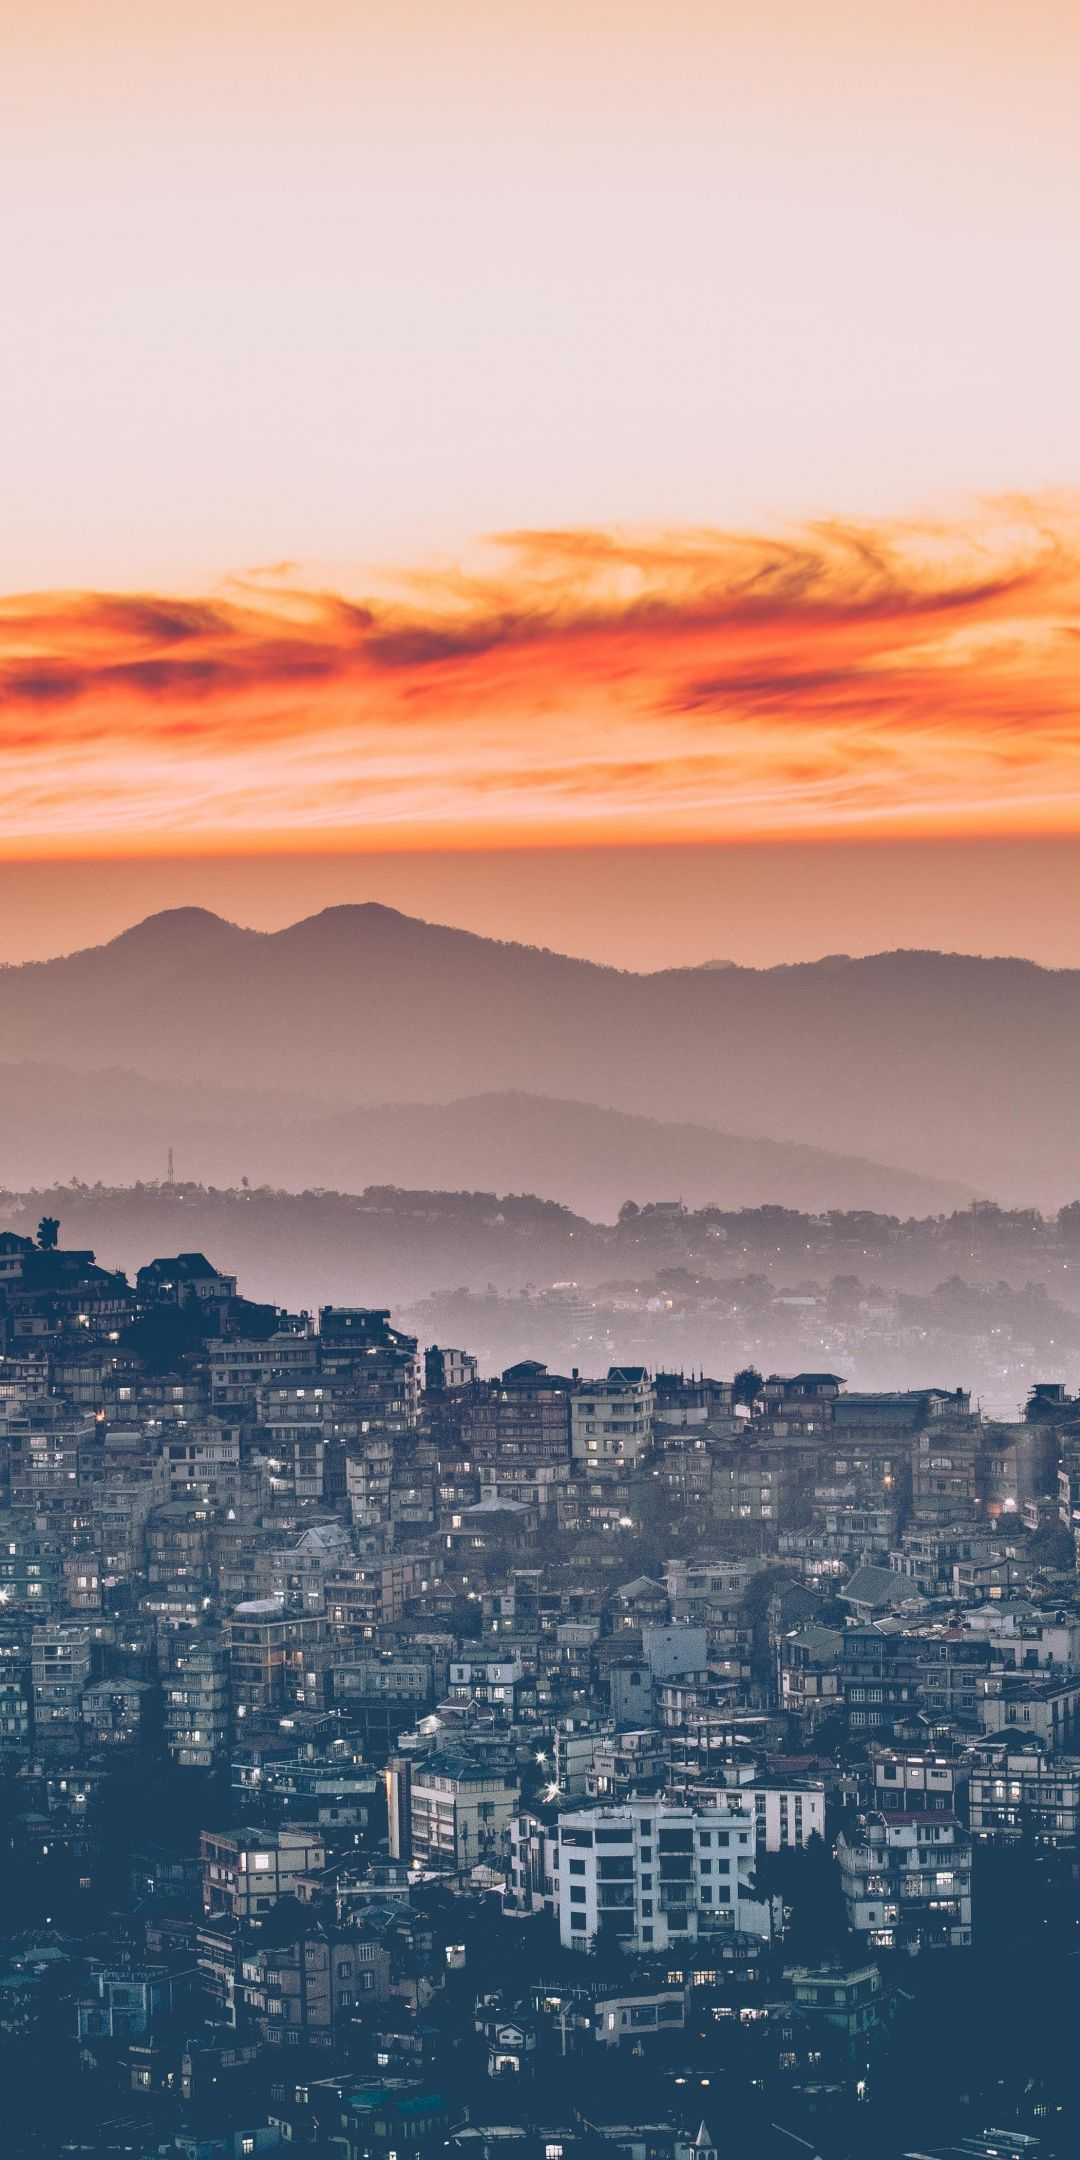 City, sunset, horizon, aerial view wallpaper View